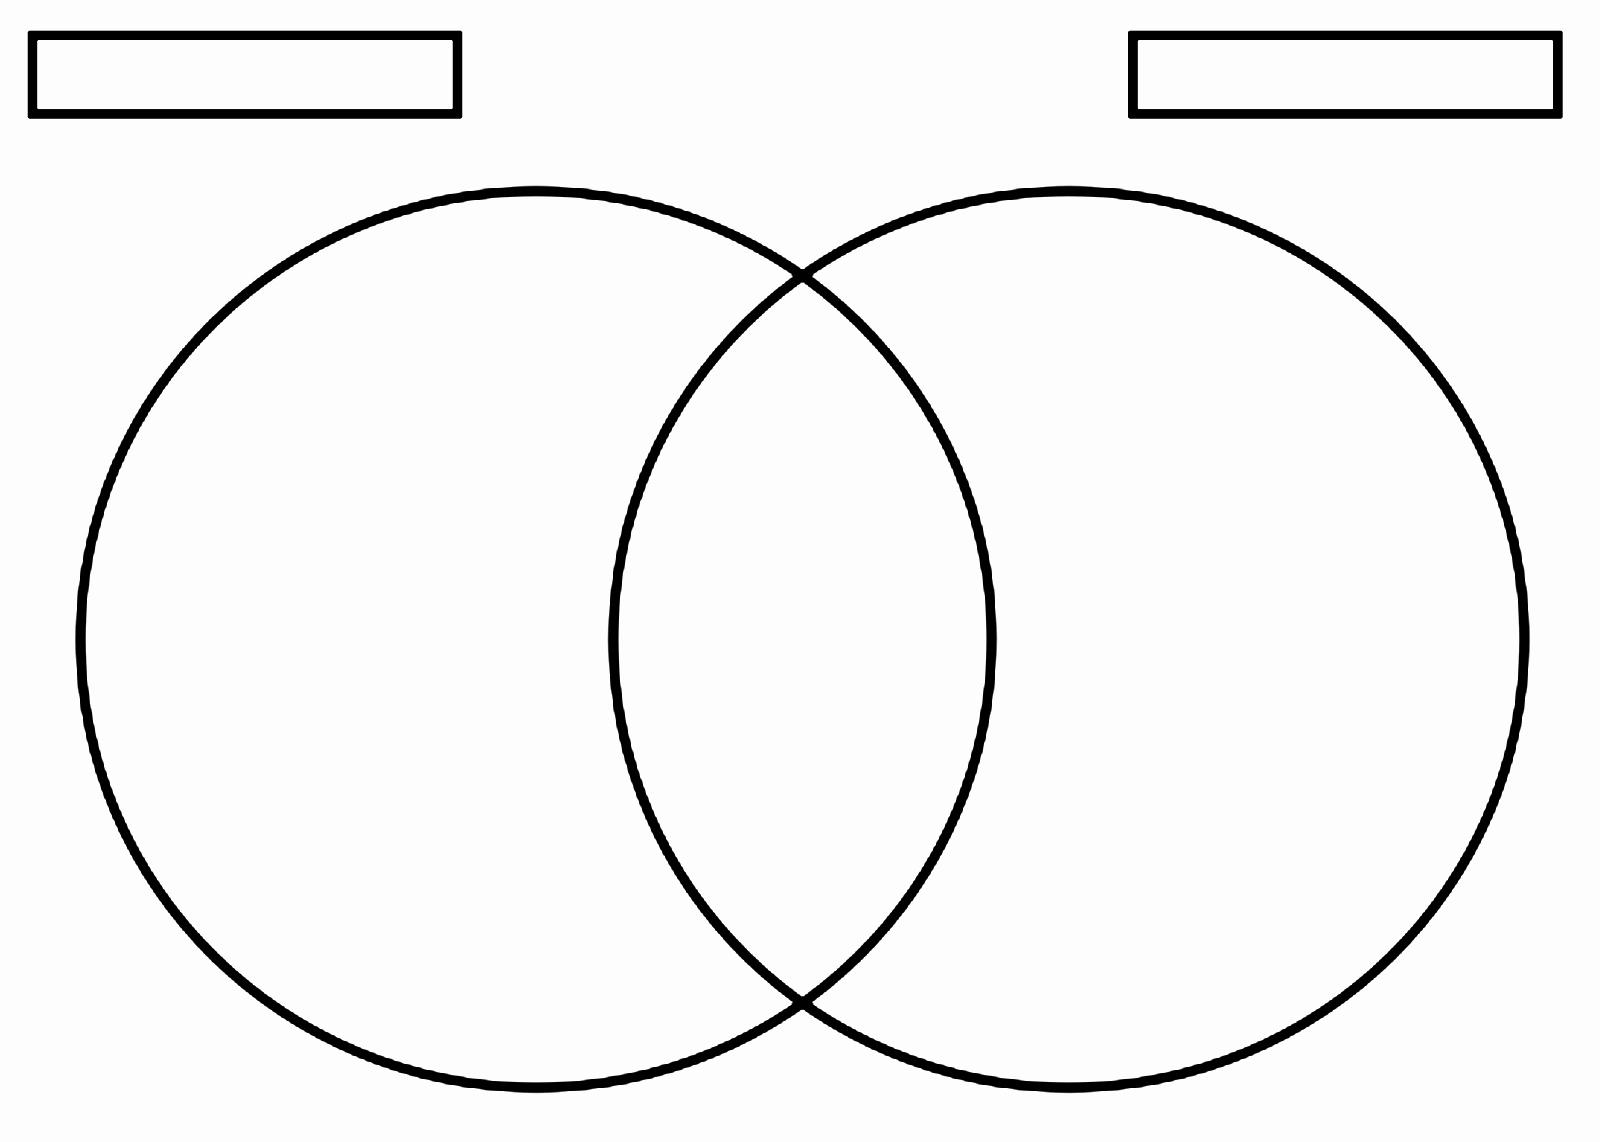 Free Venn Diagram Template Unique Free Blank Venn Diagram Template